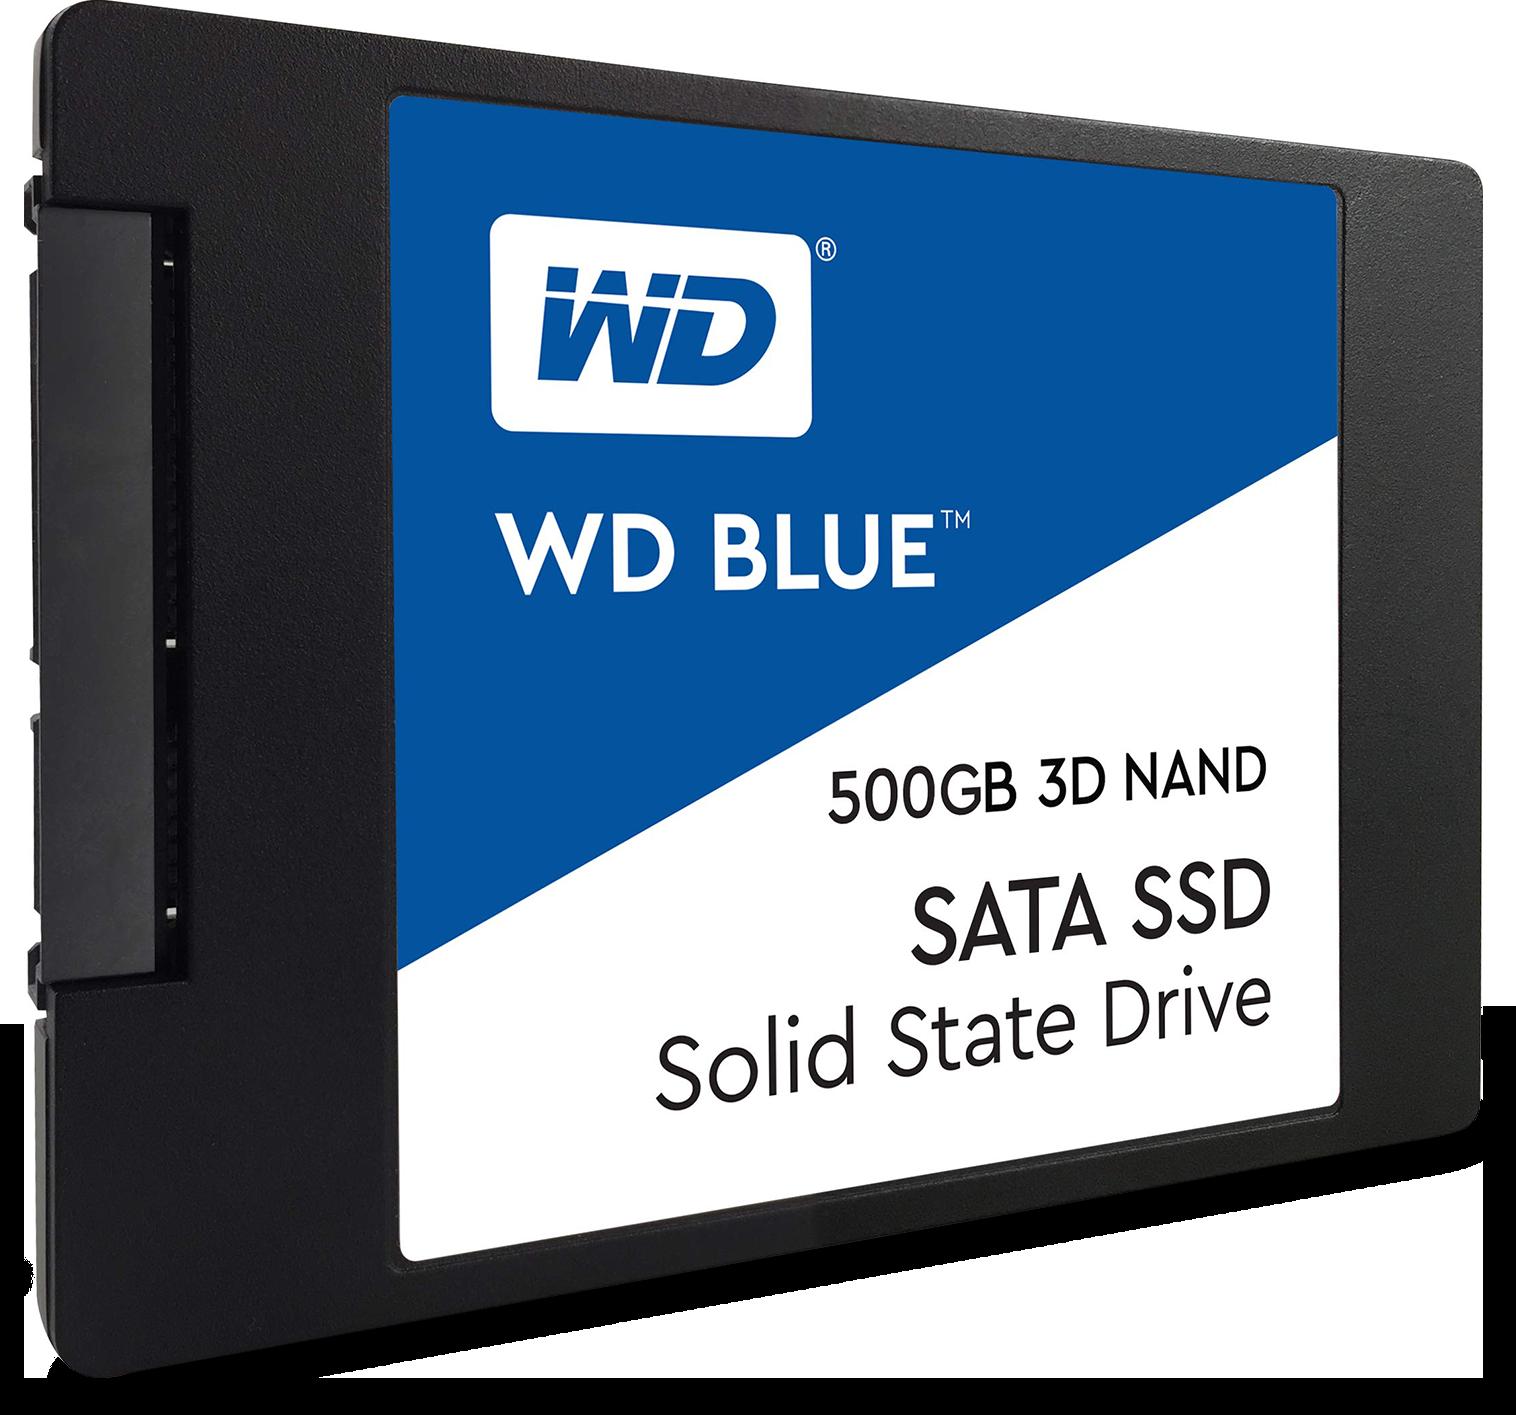 RE3znpq?ver=0aa9 - Western Digital Blue 3D NAND SATA SSD